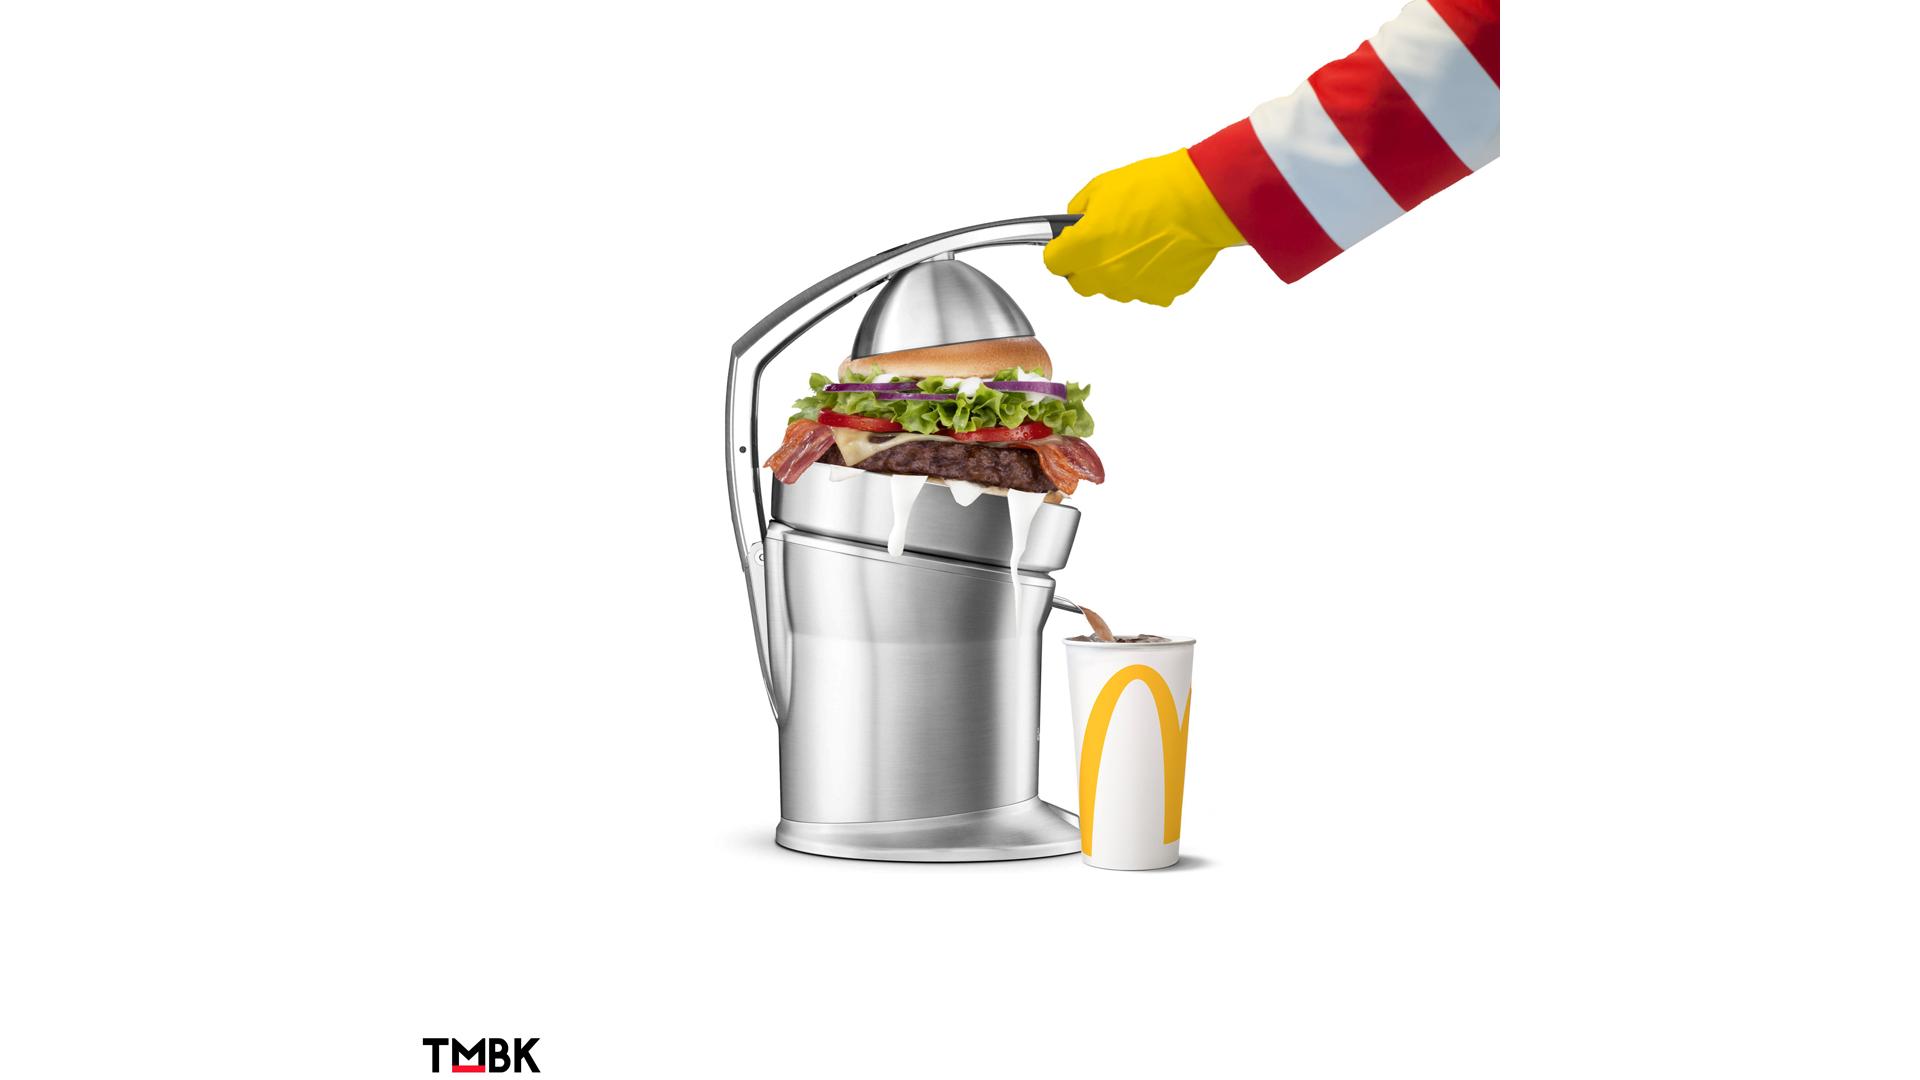 se souhlasem McDonald's a TMBK